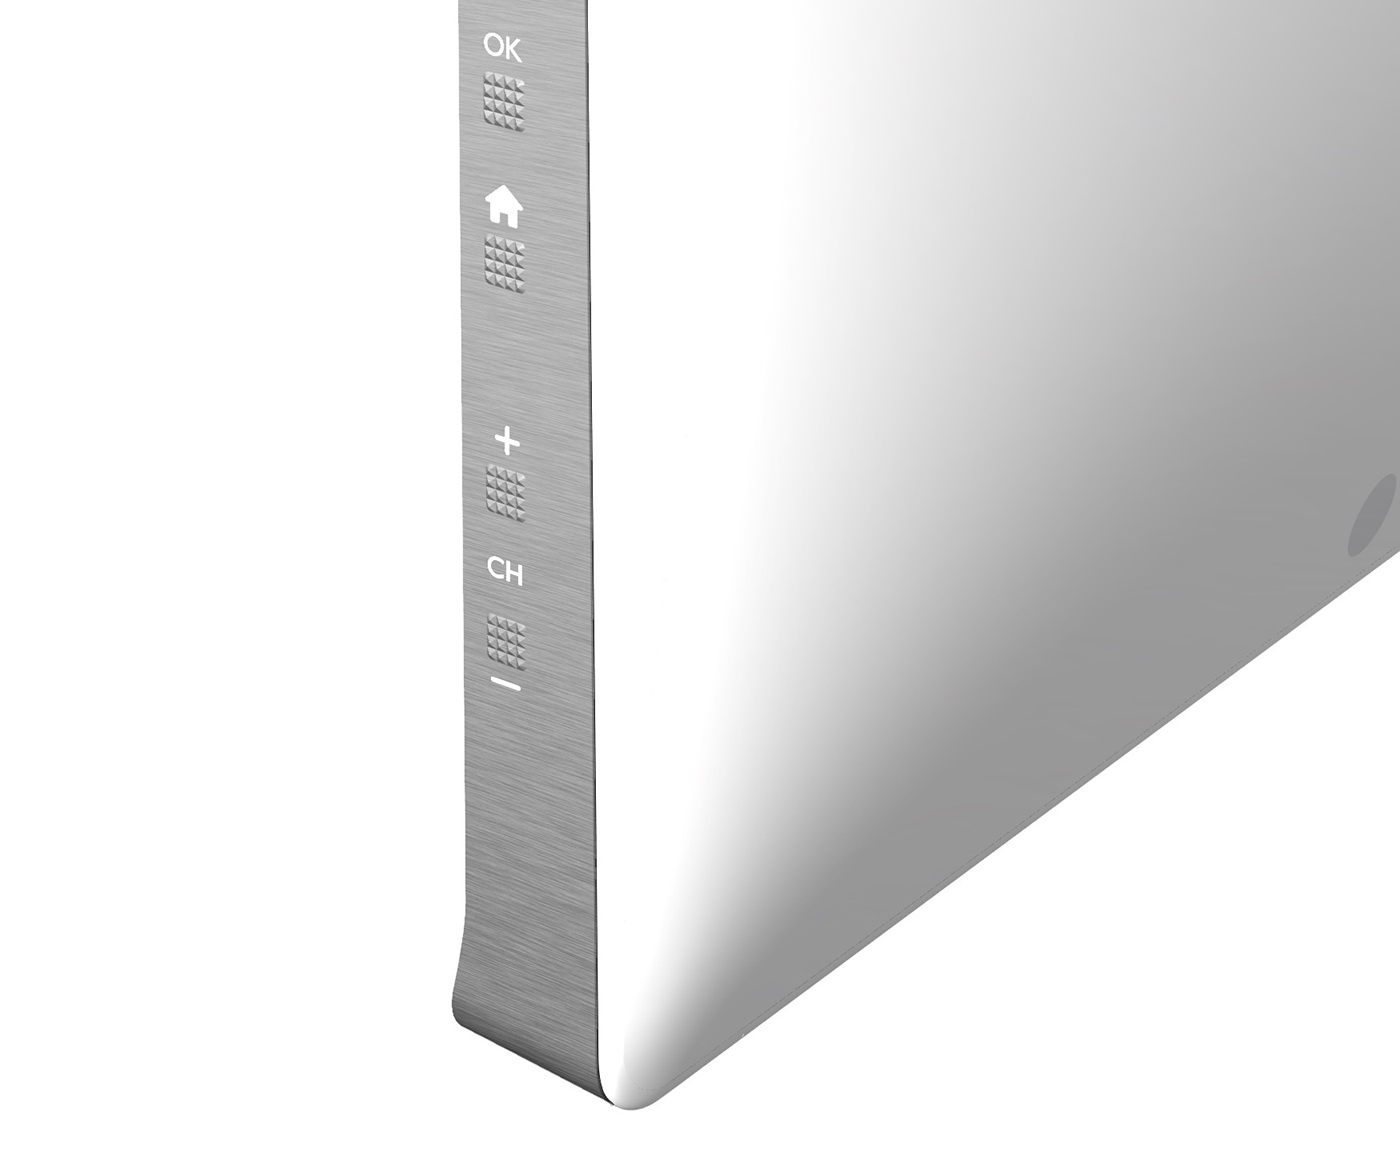 philips smart tv 6000 series on behance. Black Bedroom Furniture Sets. Home Design Ideas